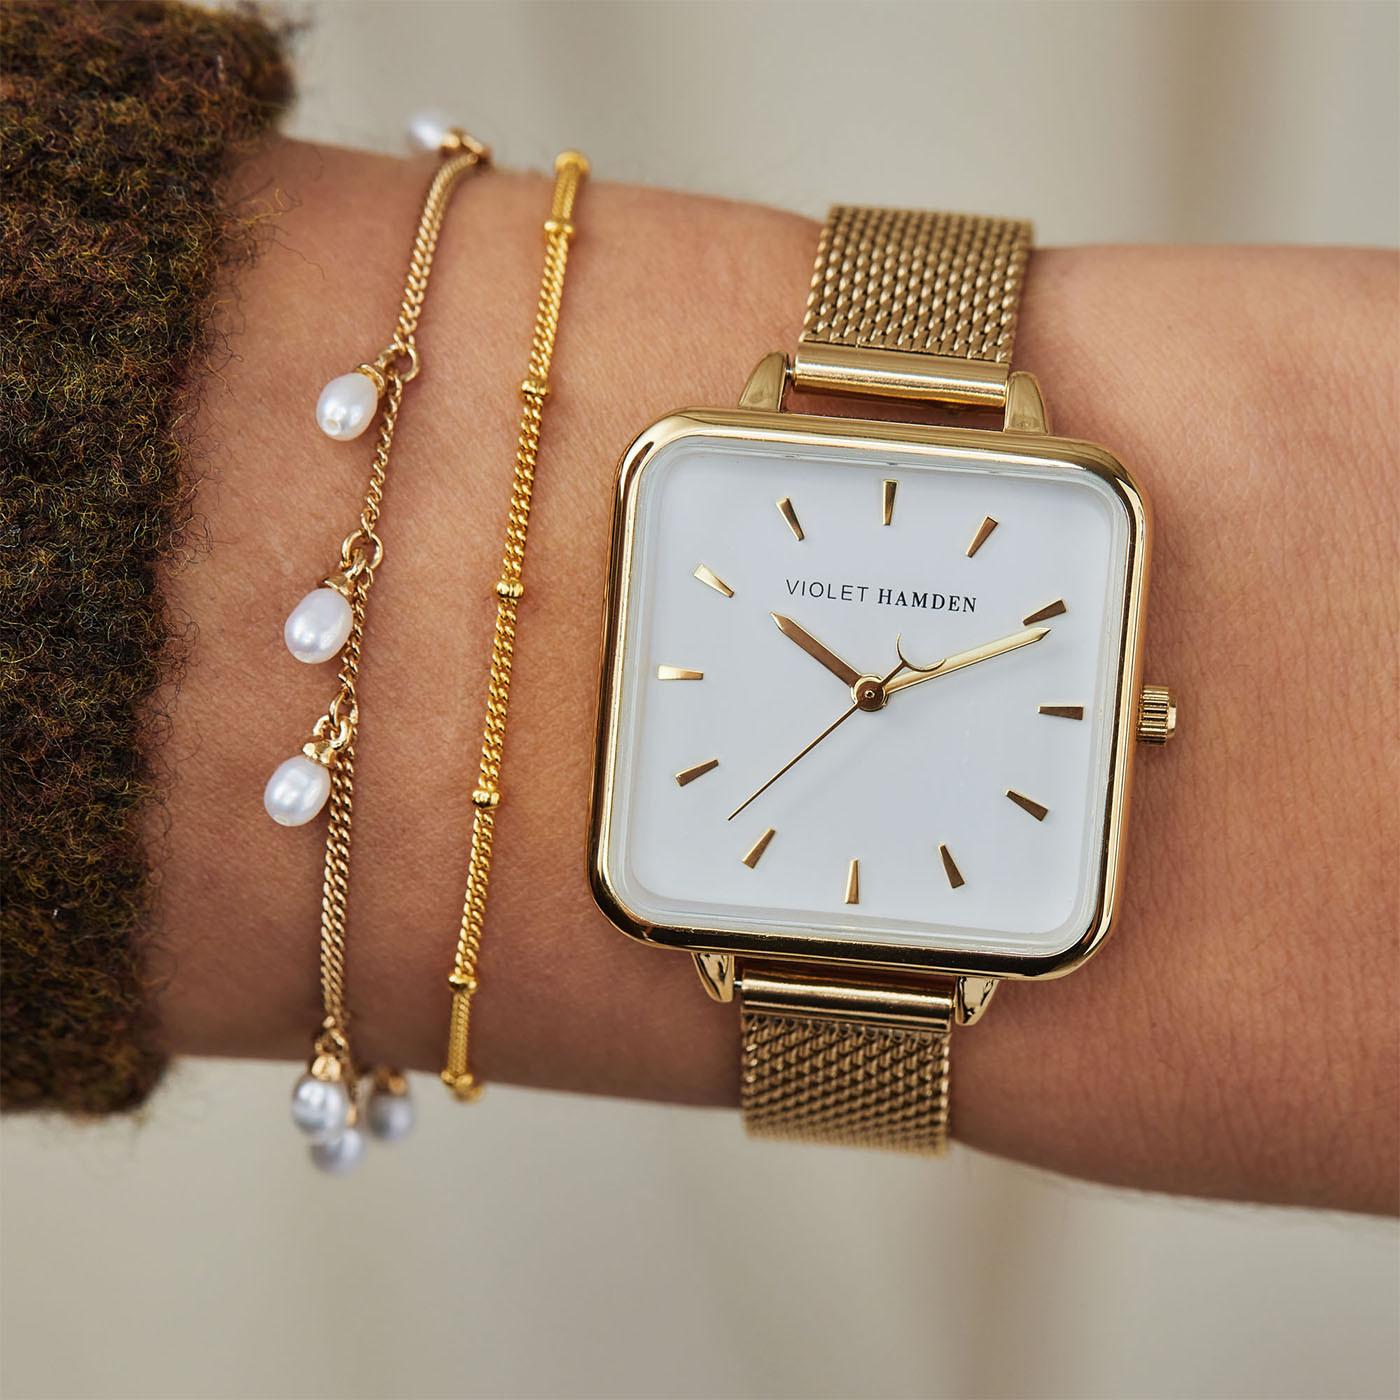 Violet Hamden Goudkleurig Dawn horloge VH02001